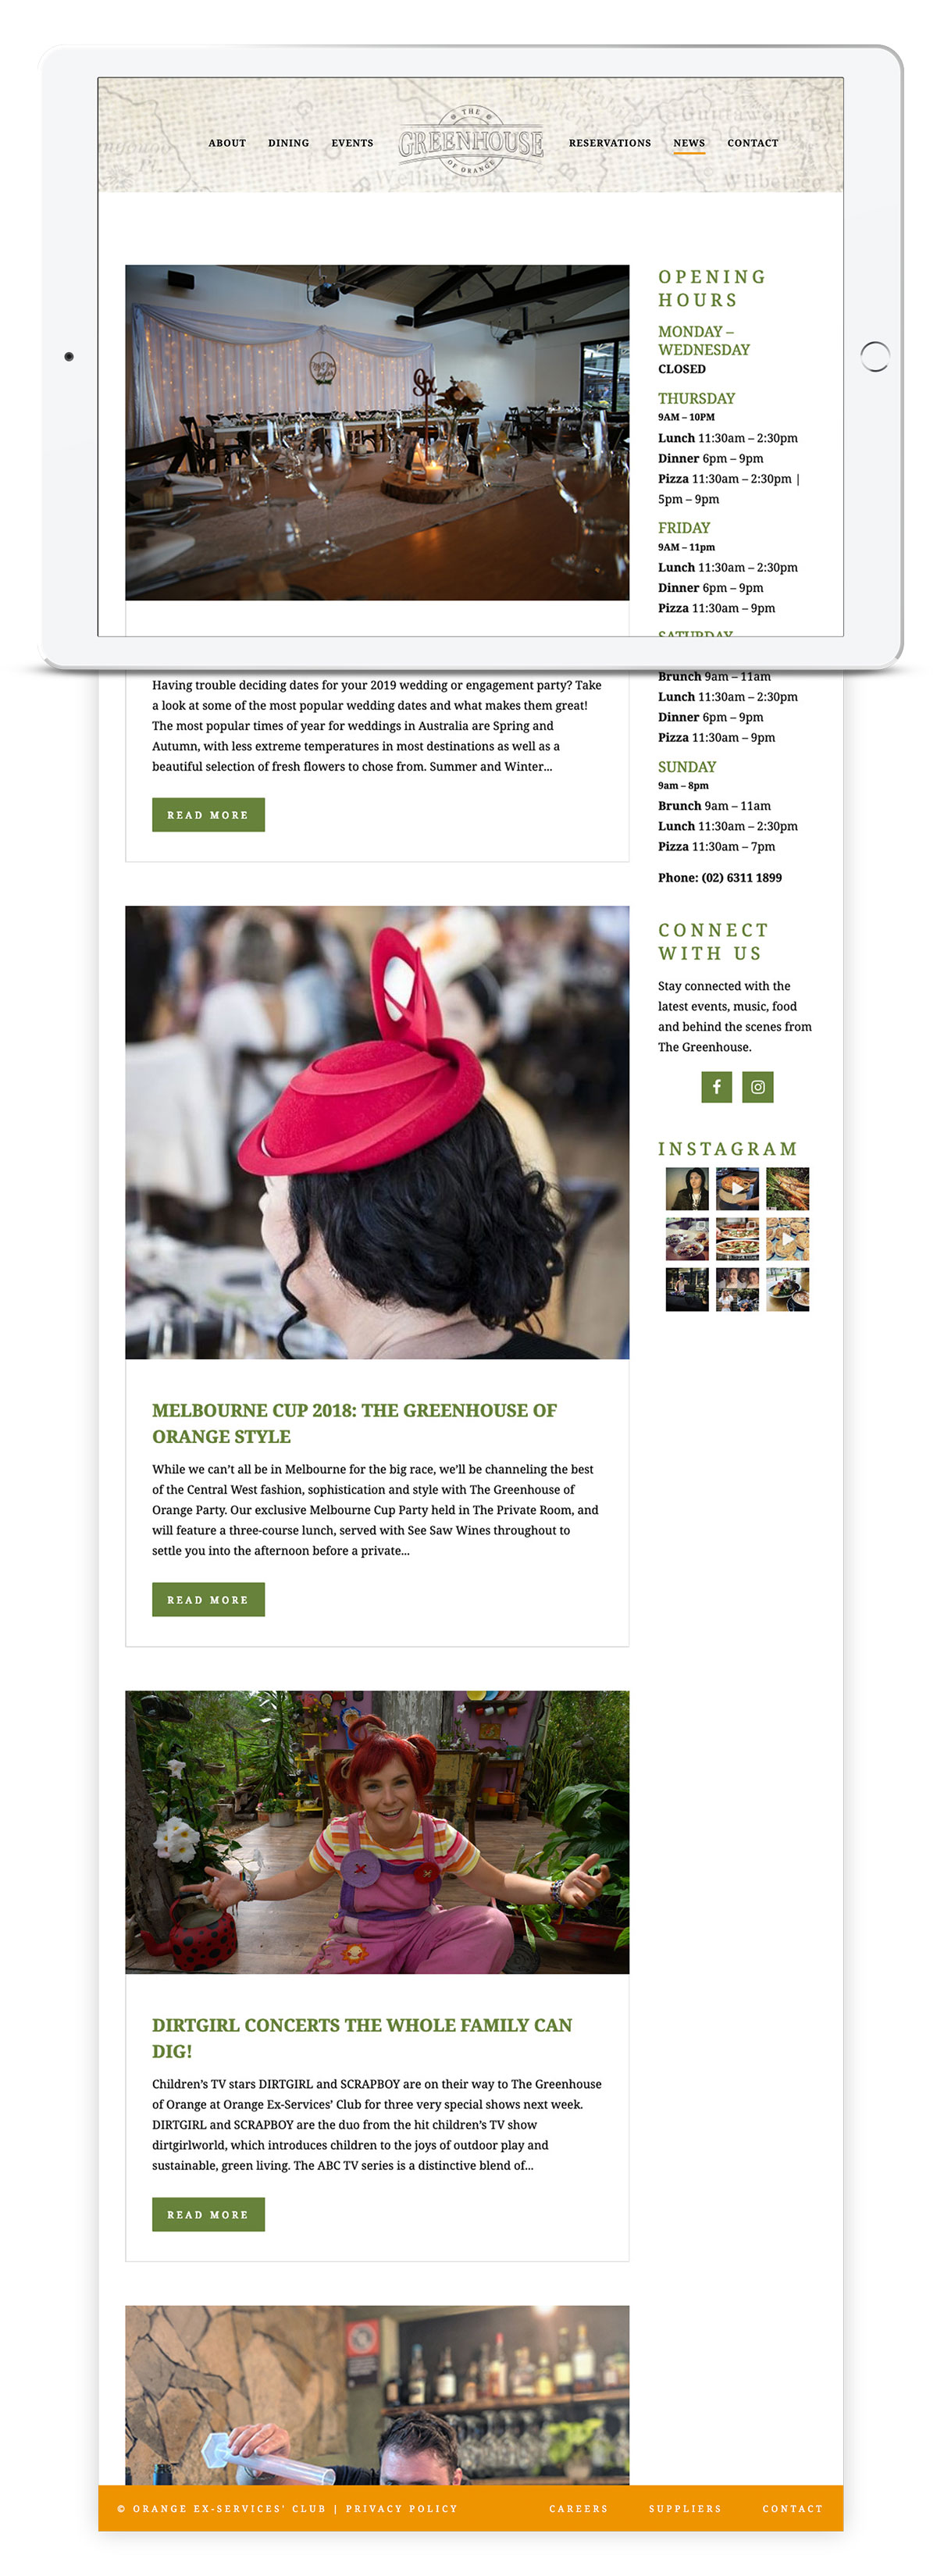 The Greenhouse of Orange blog